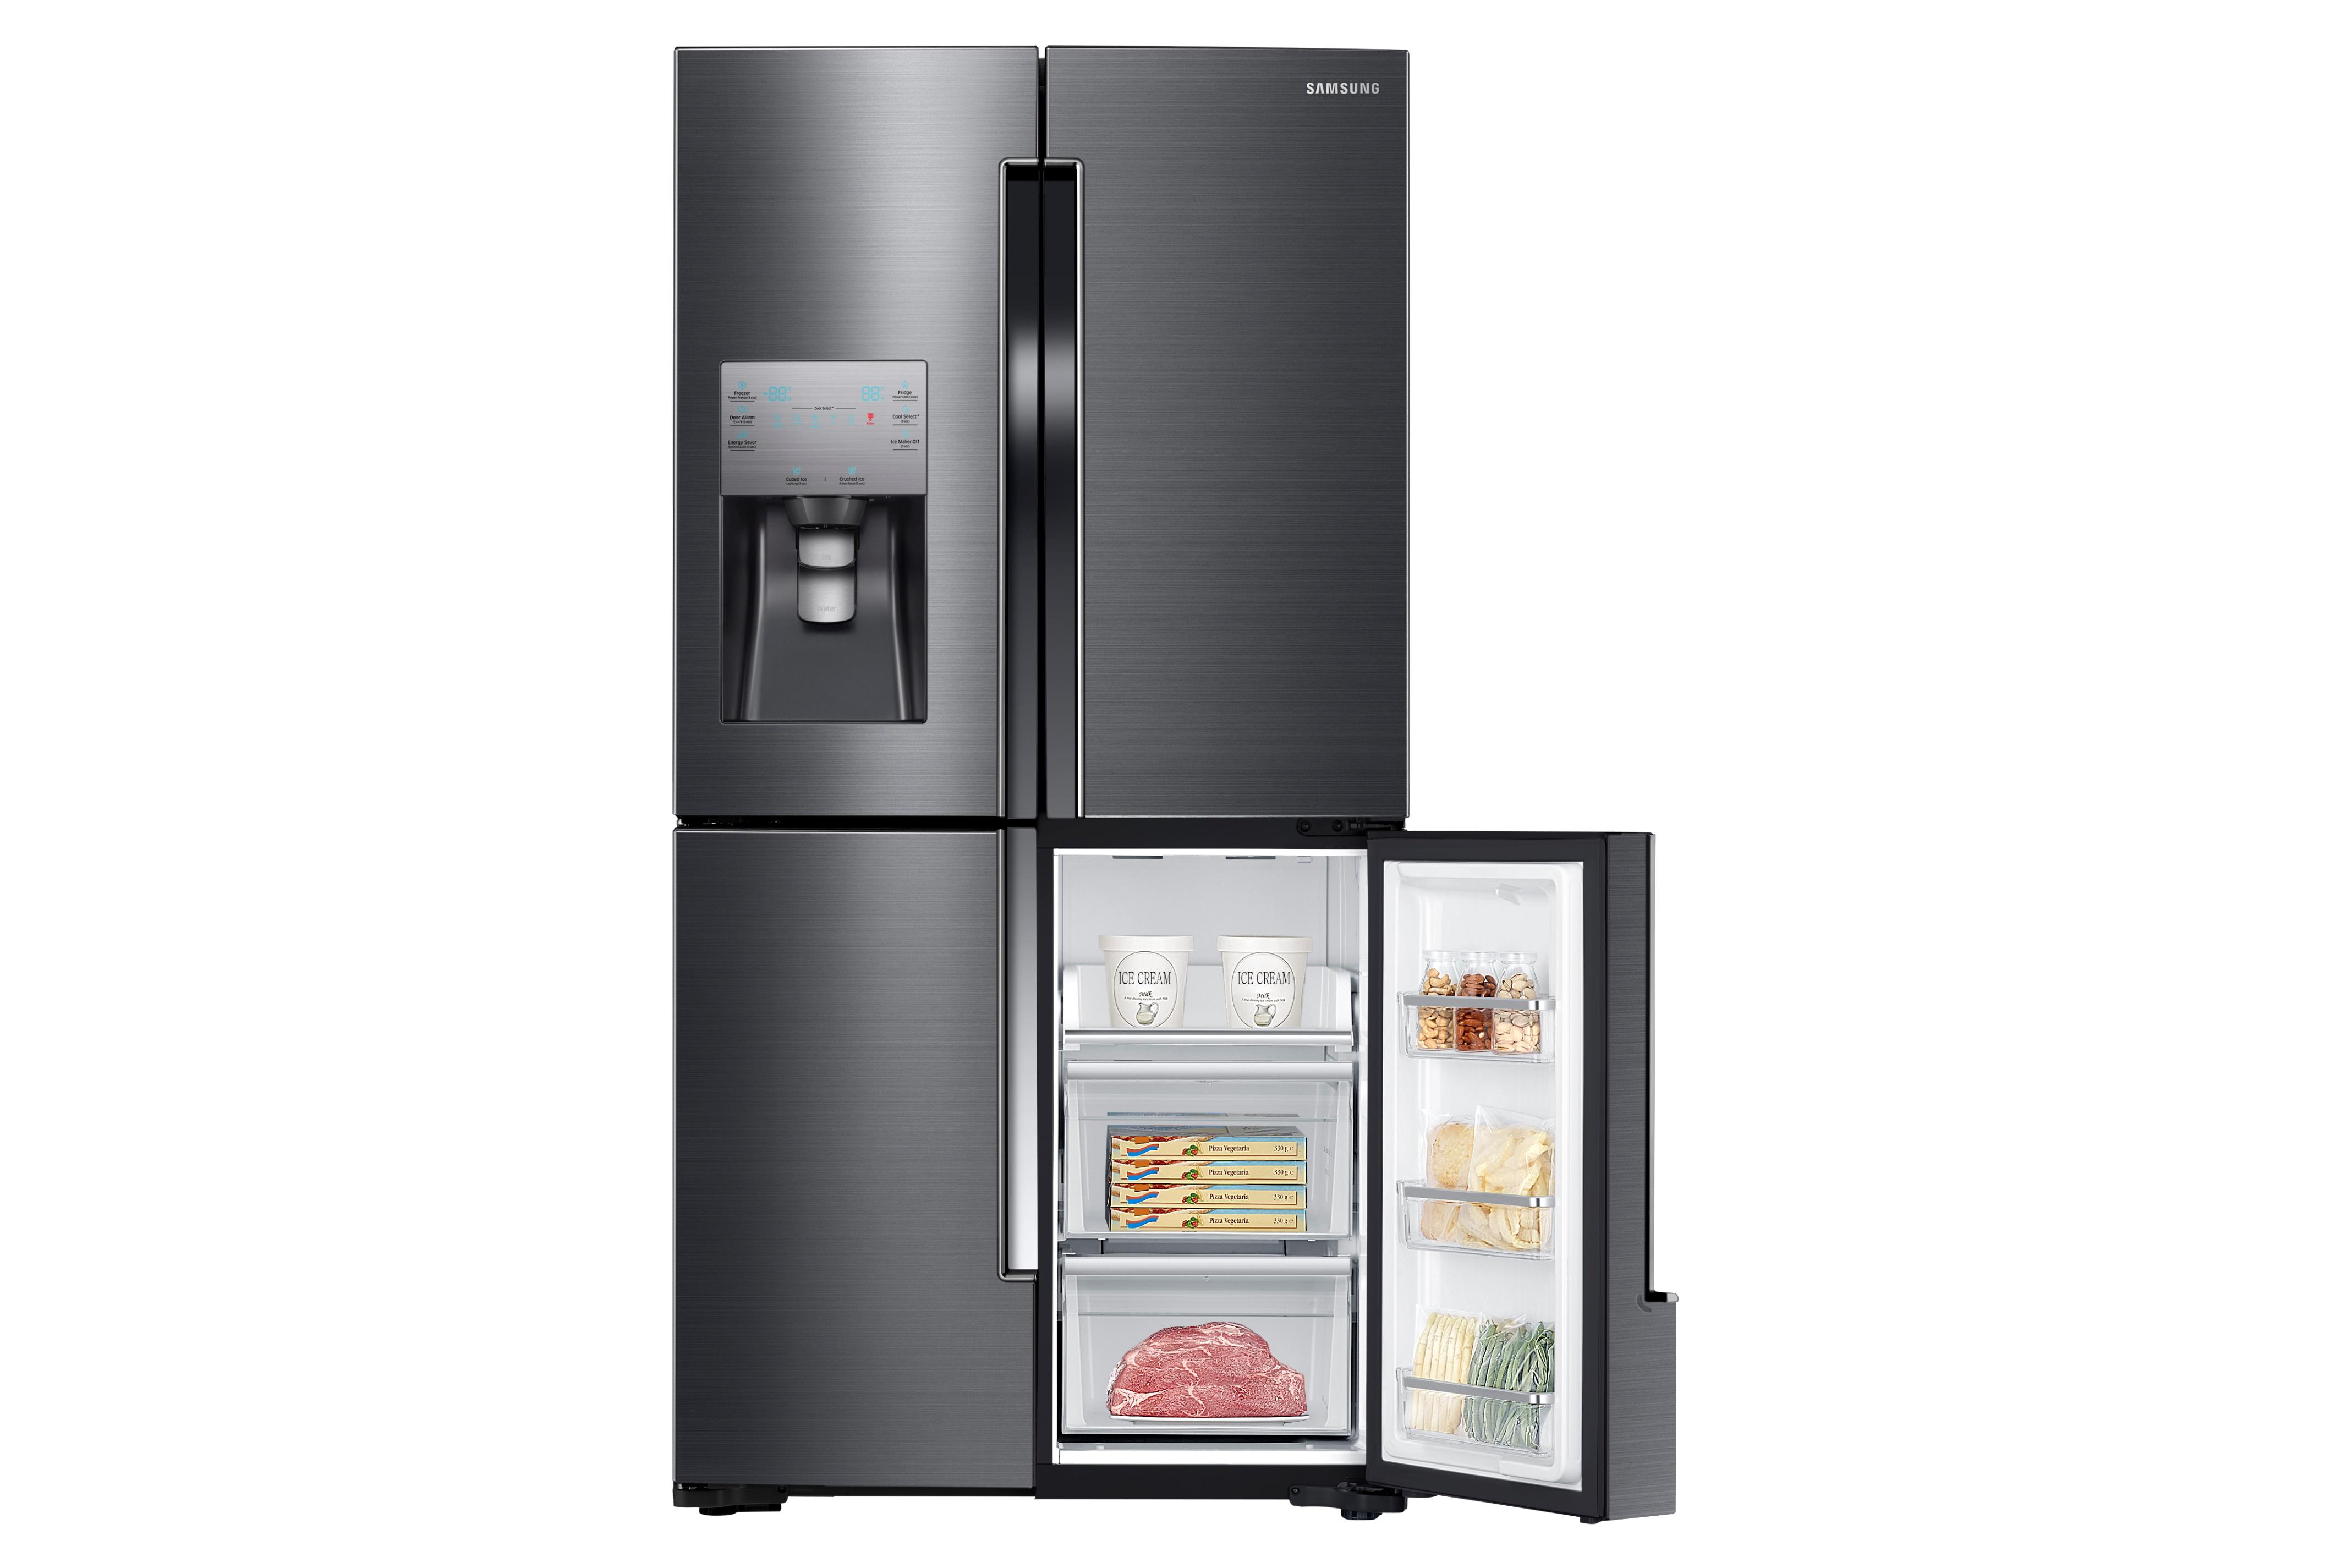 Samsung RF23J9011SG 23 cu. ft. Capacity Counter Depth 4-Door Flex™ Refrigerator with FlexZone™ Black Stainless Steel